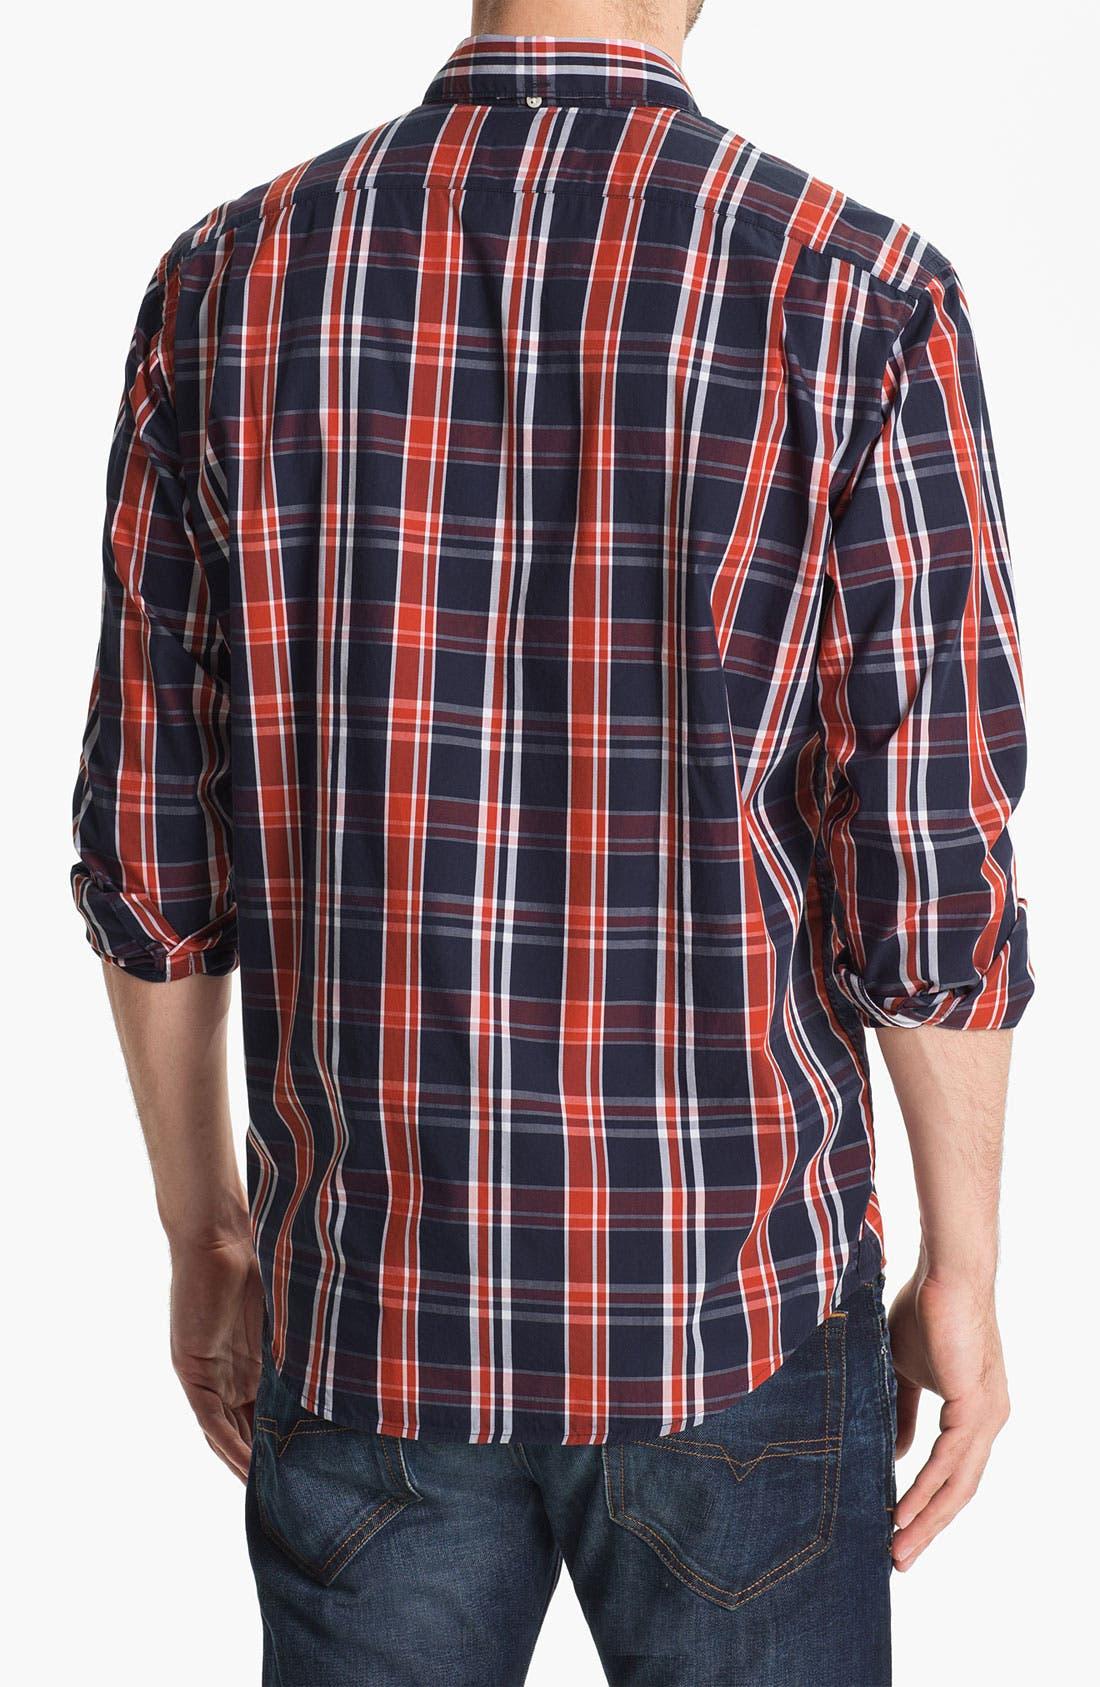 Alternate Image 2  - Lacoste Plaid Woven Shirt